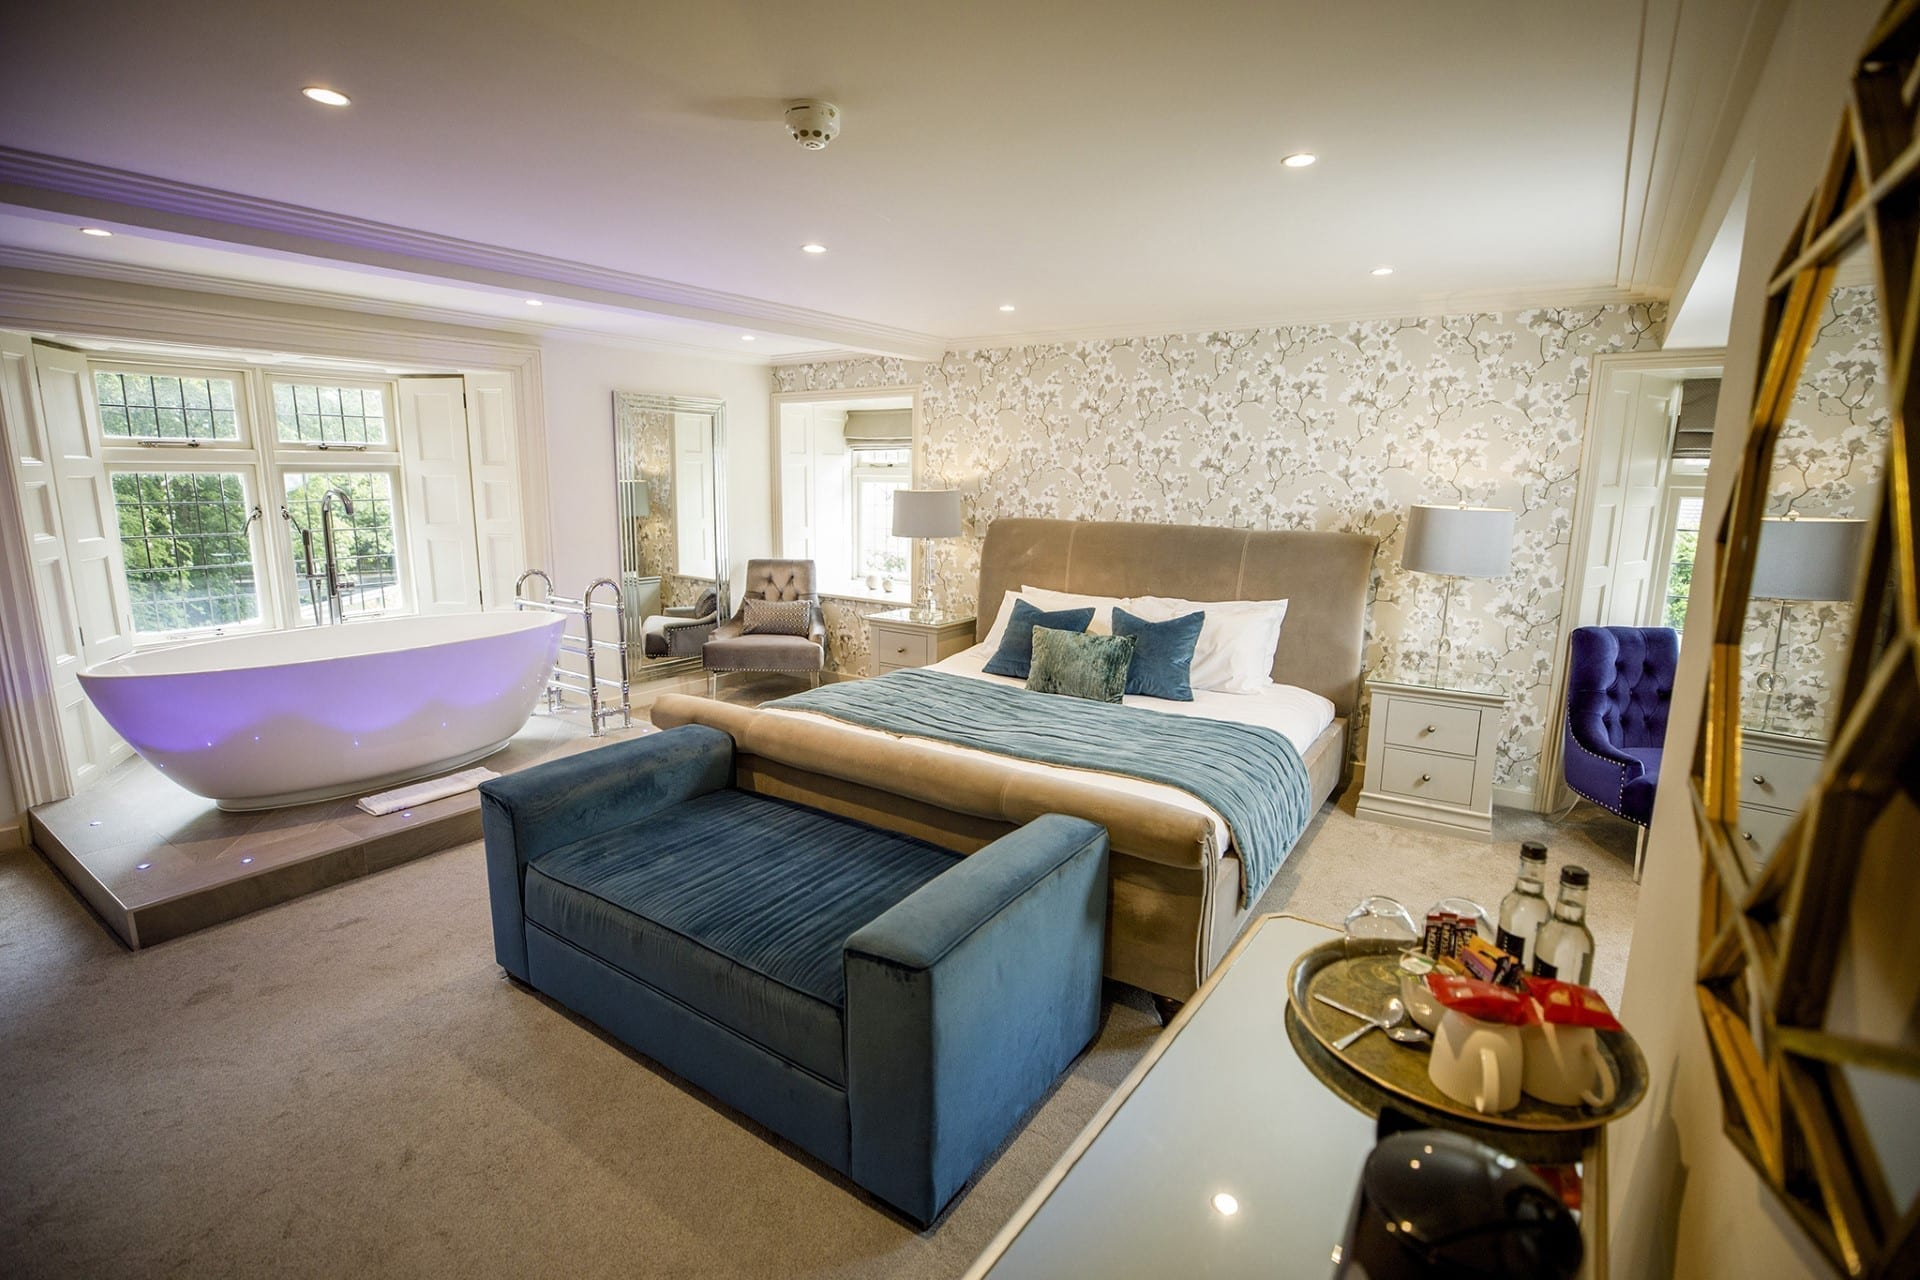 Lanelay Hall Hotel and Spa